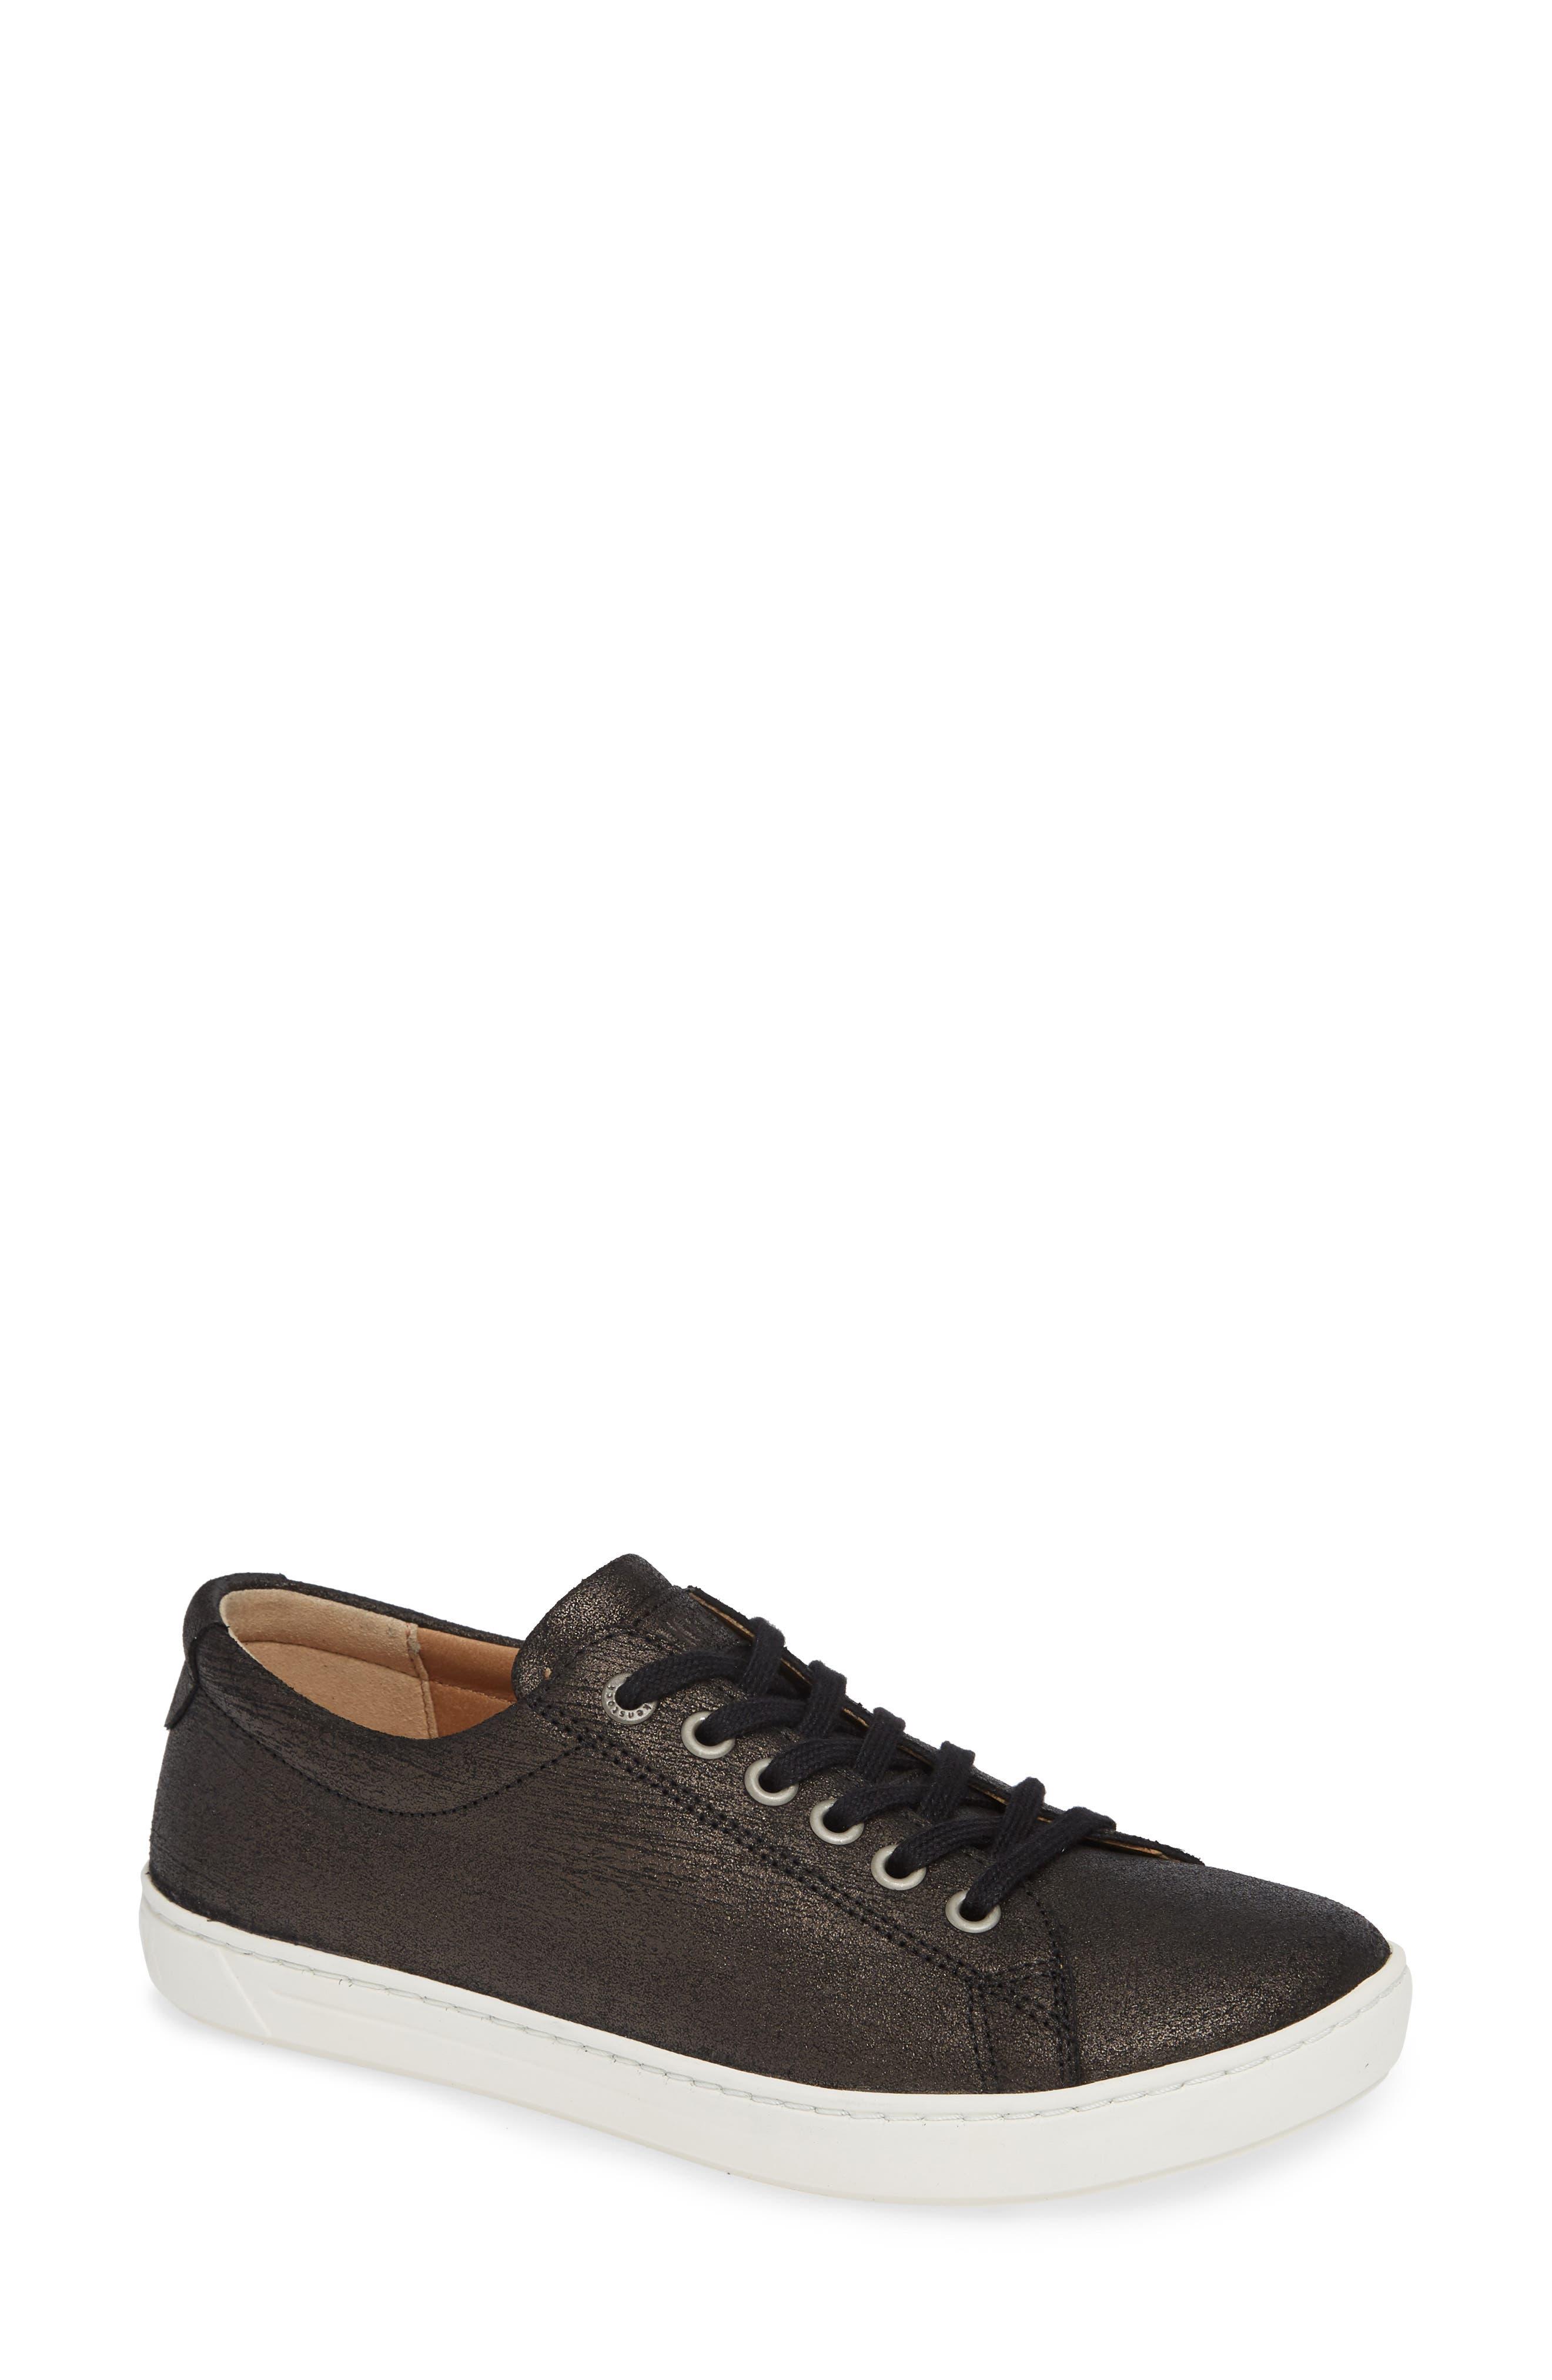 Arran Sneaker,                         Main,                         color, METALLIC BLACK